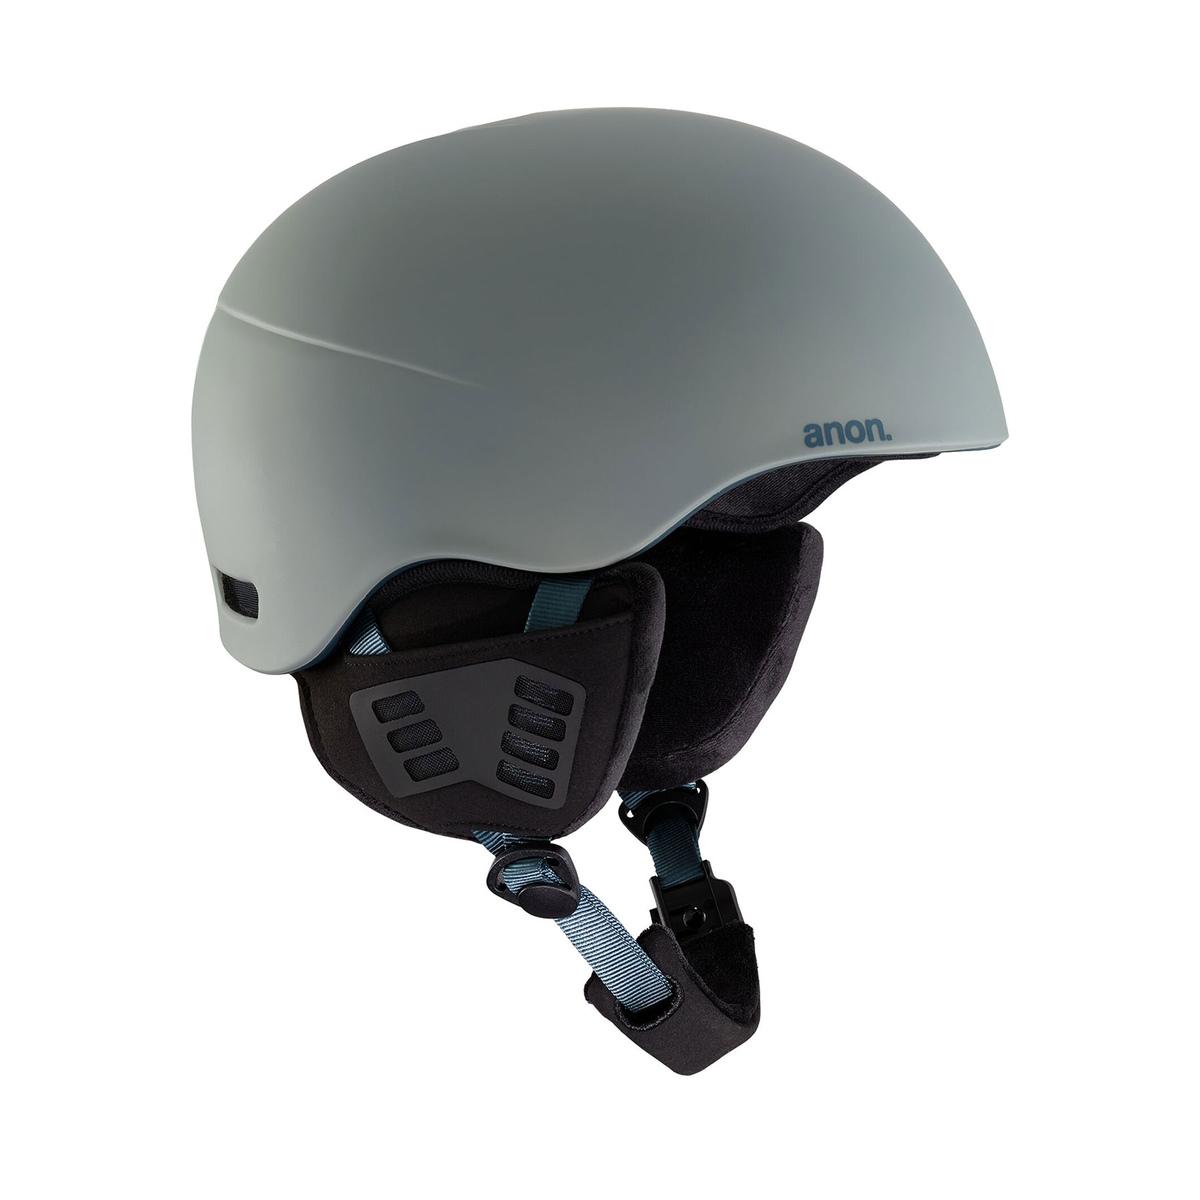 Prezzi Anon casco helo 2.0